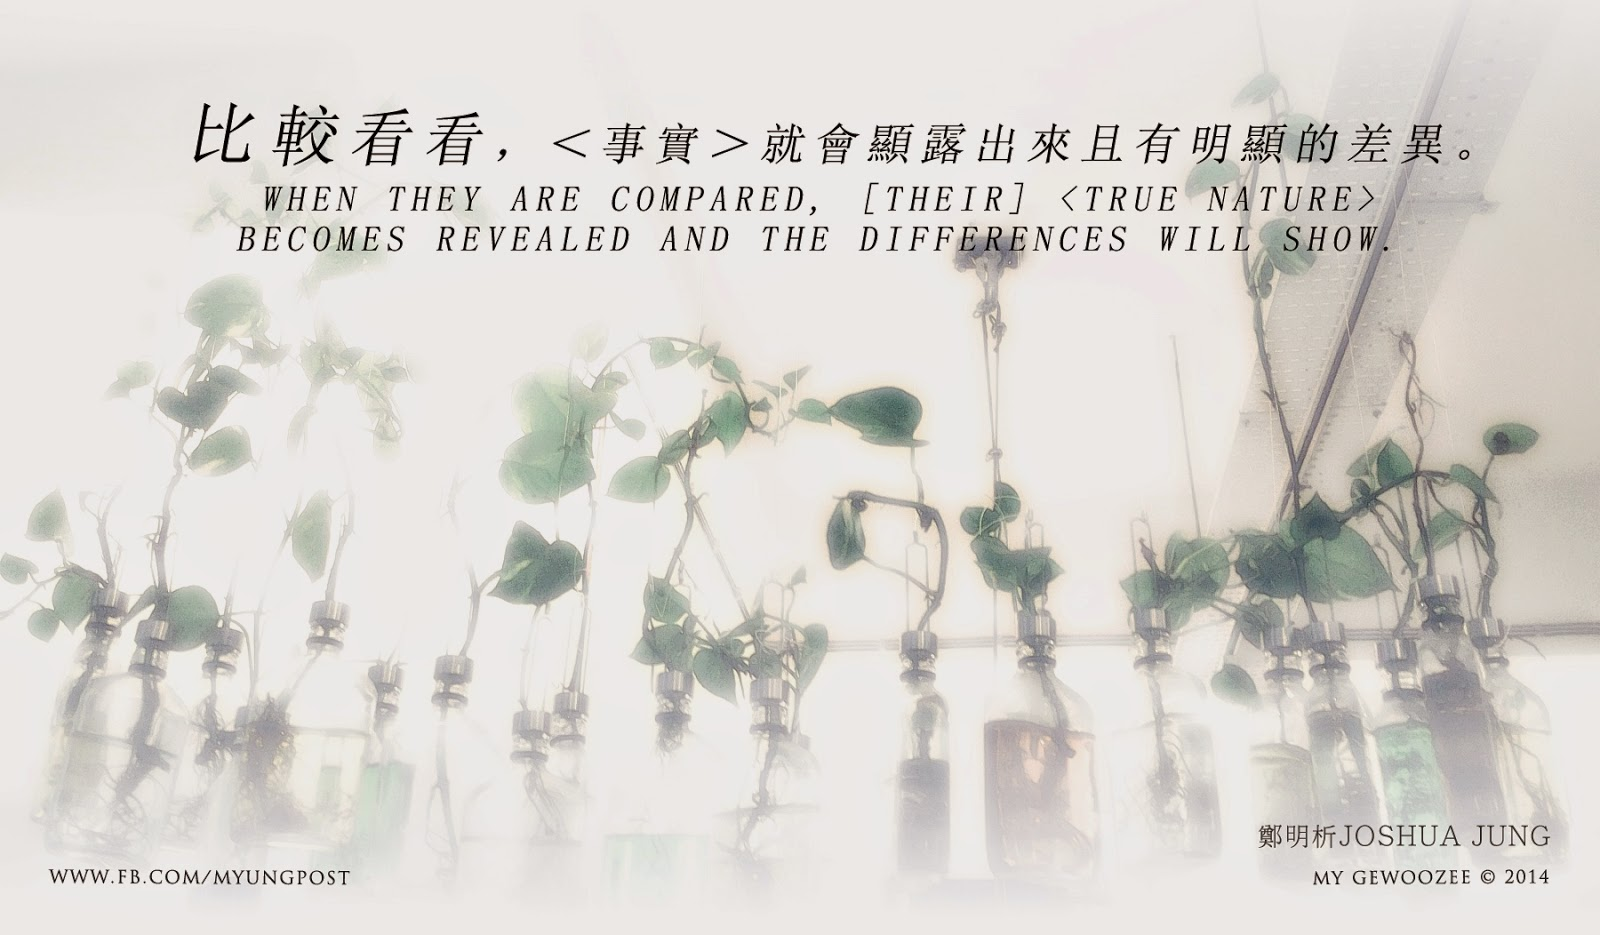 鄭明析,攝理教會,月明洞,植物,比較,事實,Joshua Jung, Providence, Wolmyeung Dong, plant, comapre, true